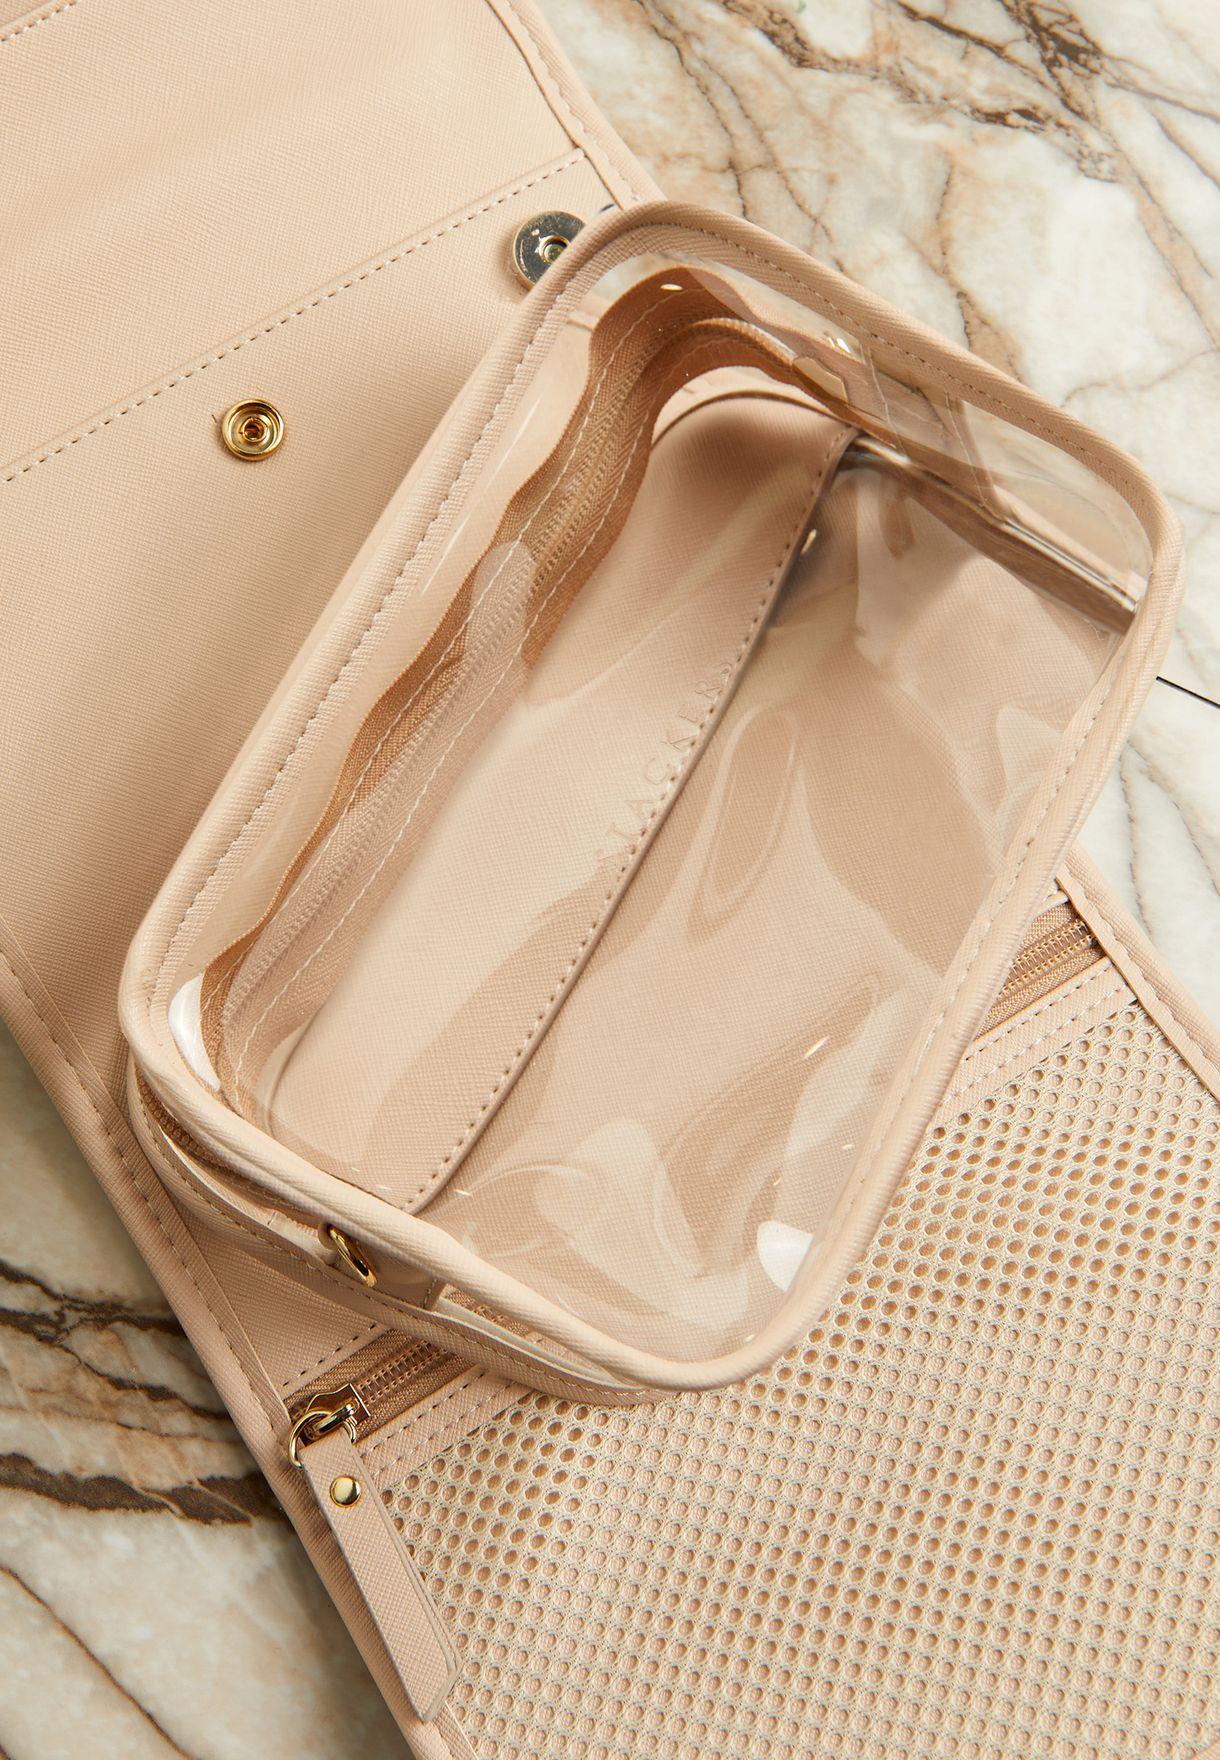 Multi Purpose Small Hanging Travel Wash Bag